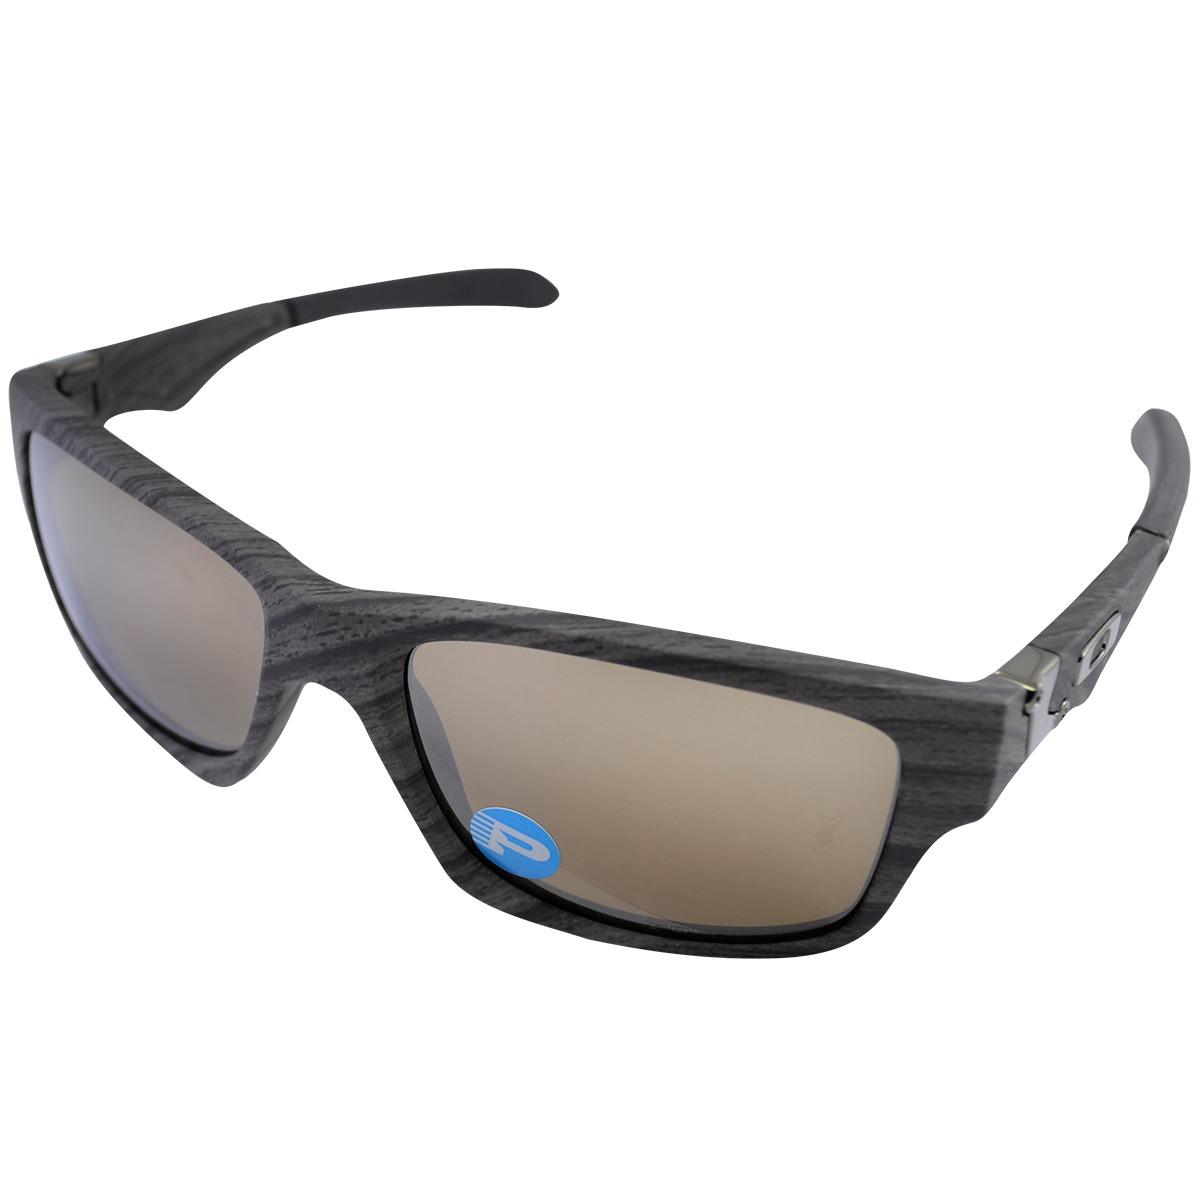 6cf9fbdea óculos oakley jupiter squared woodgrain/lente tungsten iridi. Carregando  zoom.